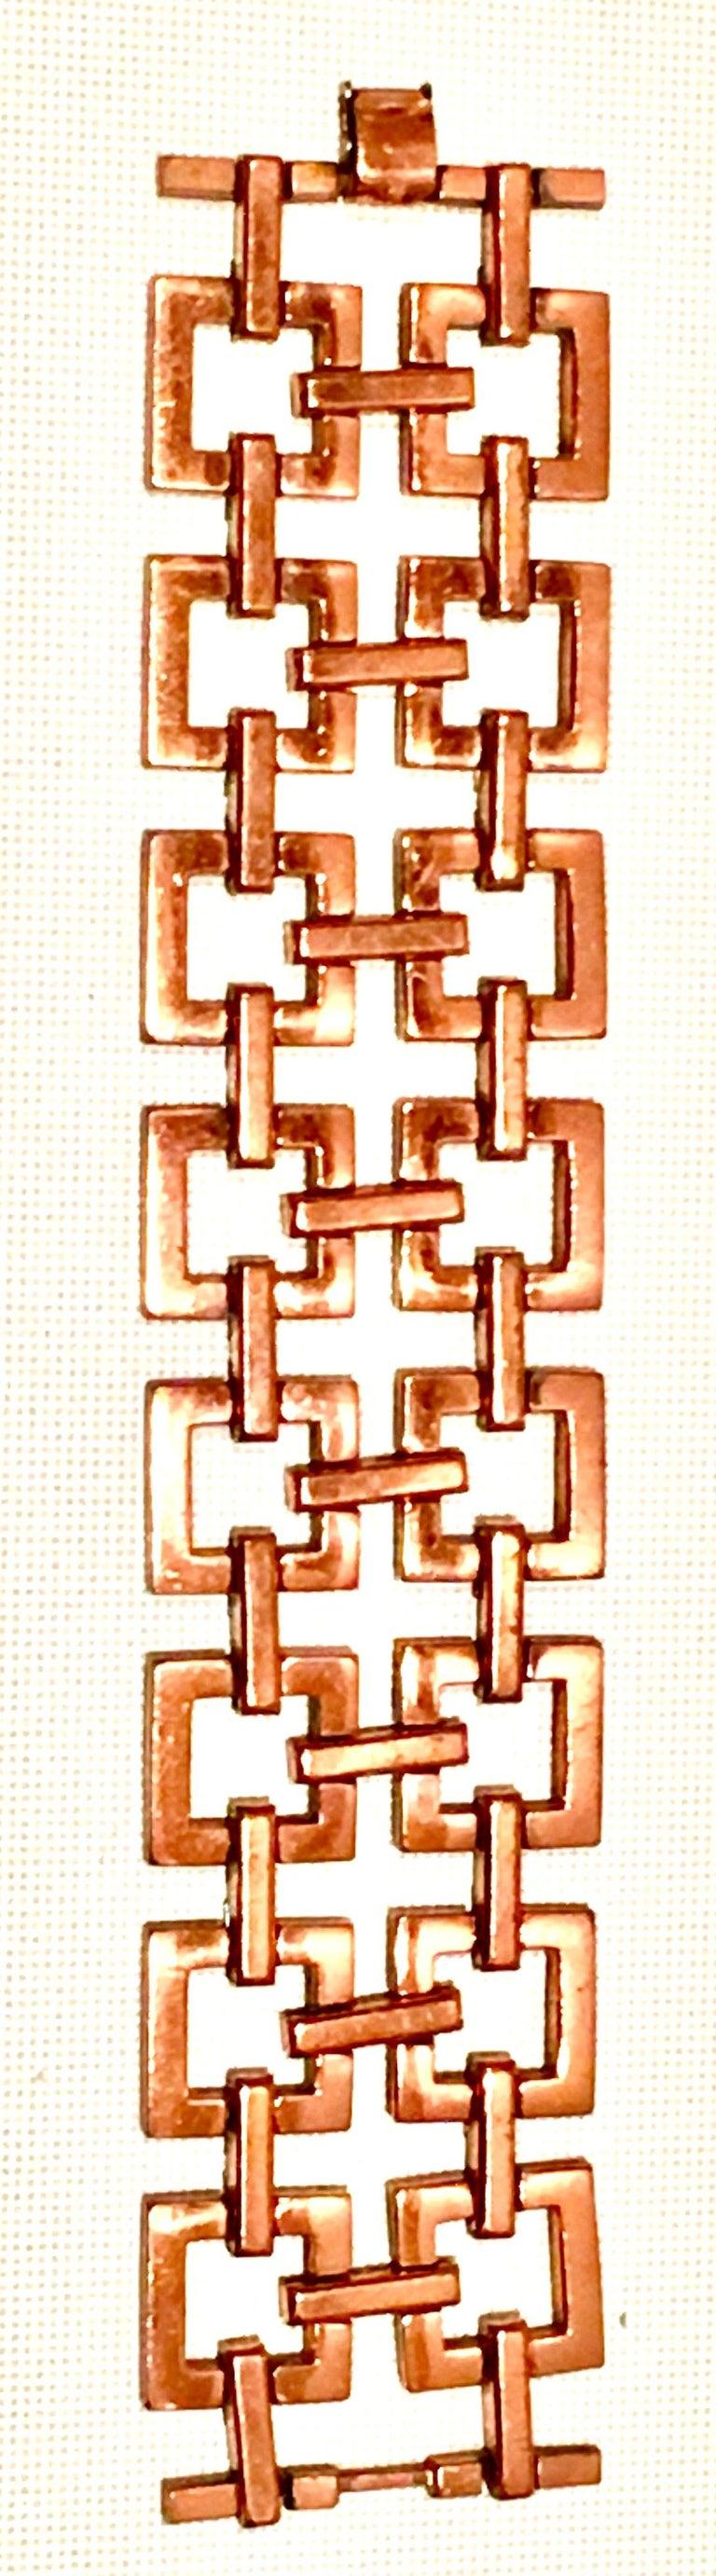 50'S Modernist Copper Geometric Chain Link Bracelet & Earrings S/3 By Matisse For Sale 1